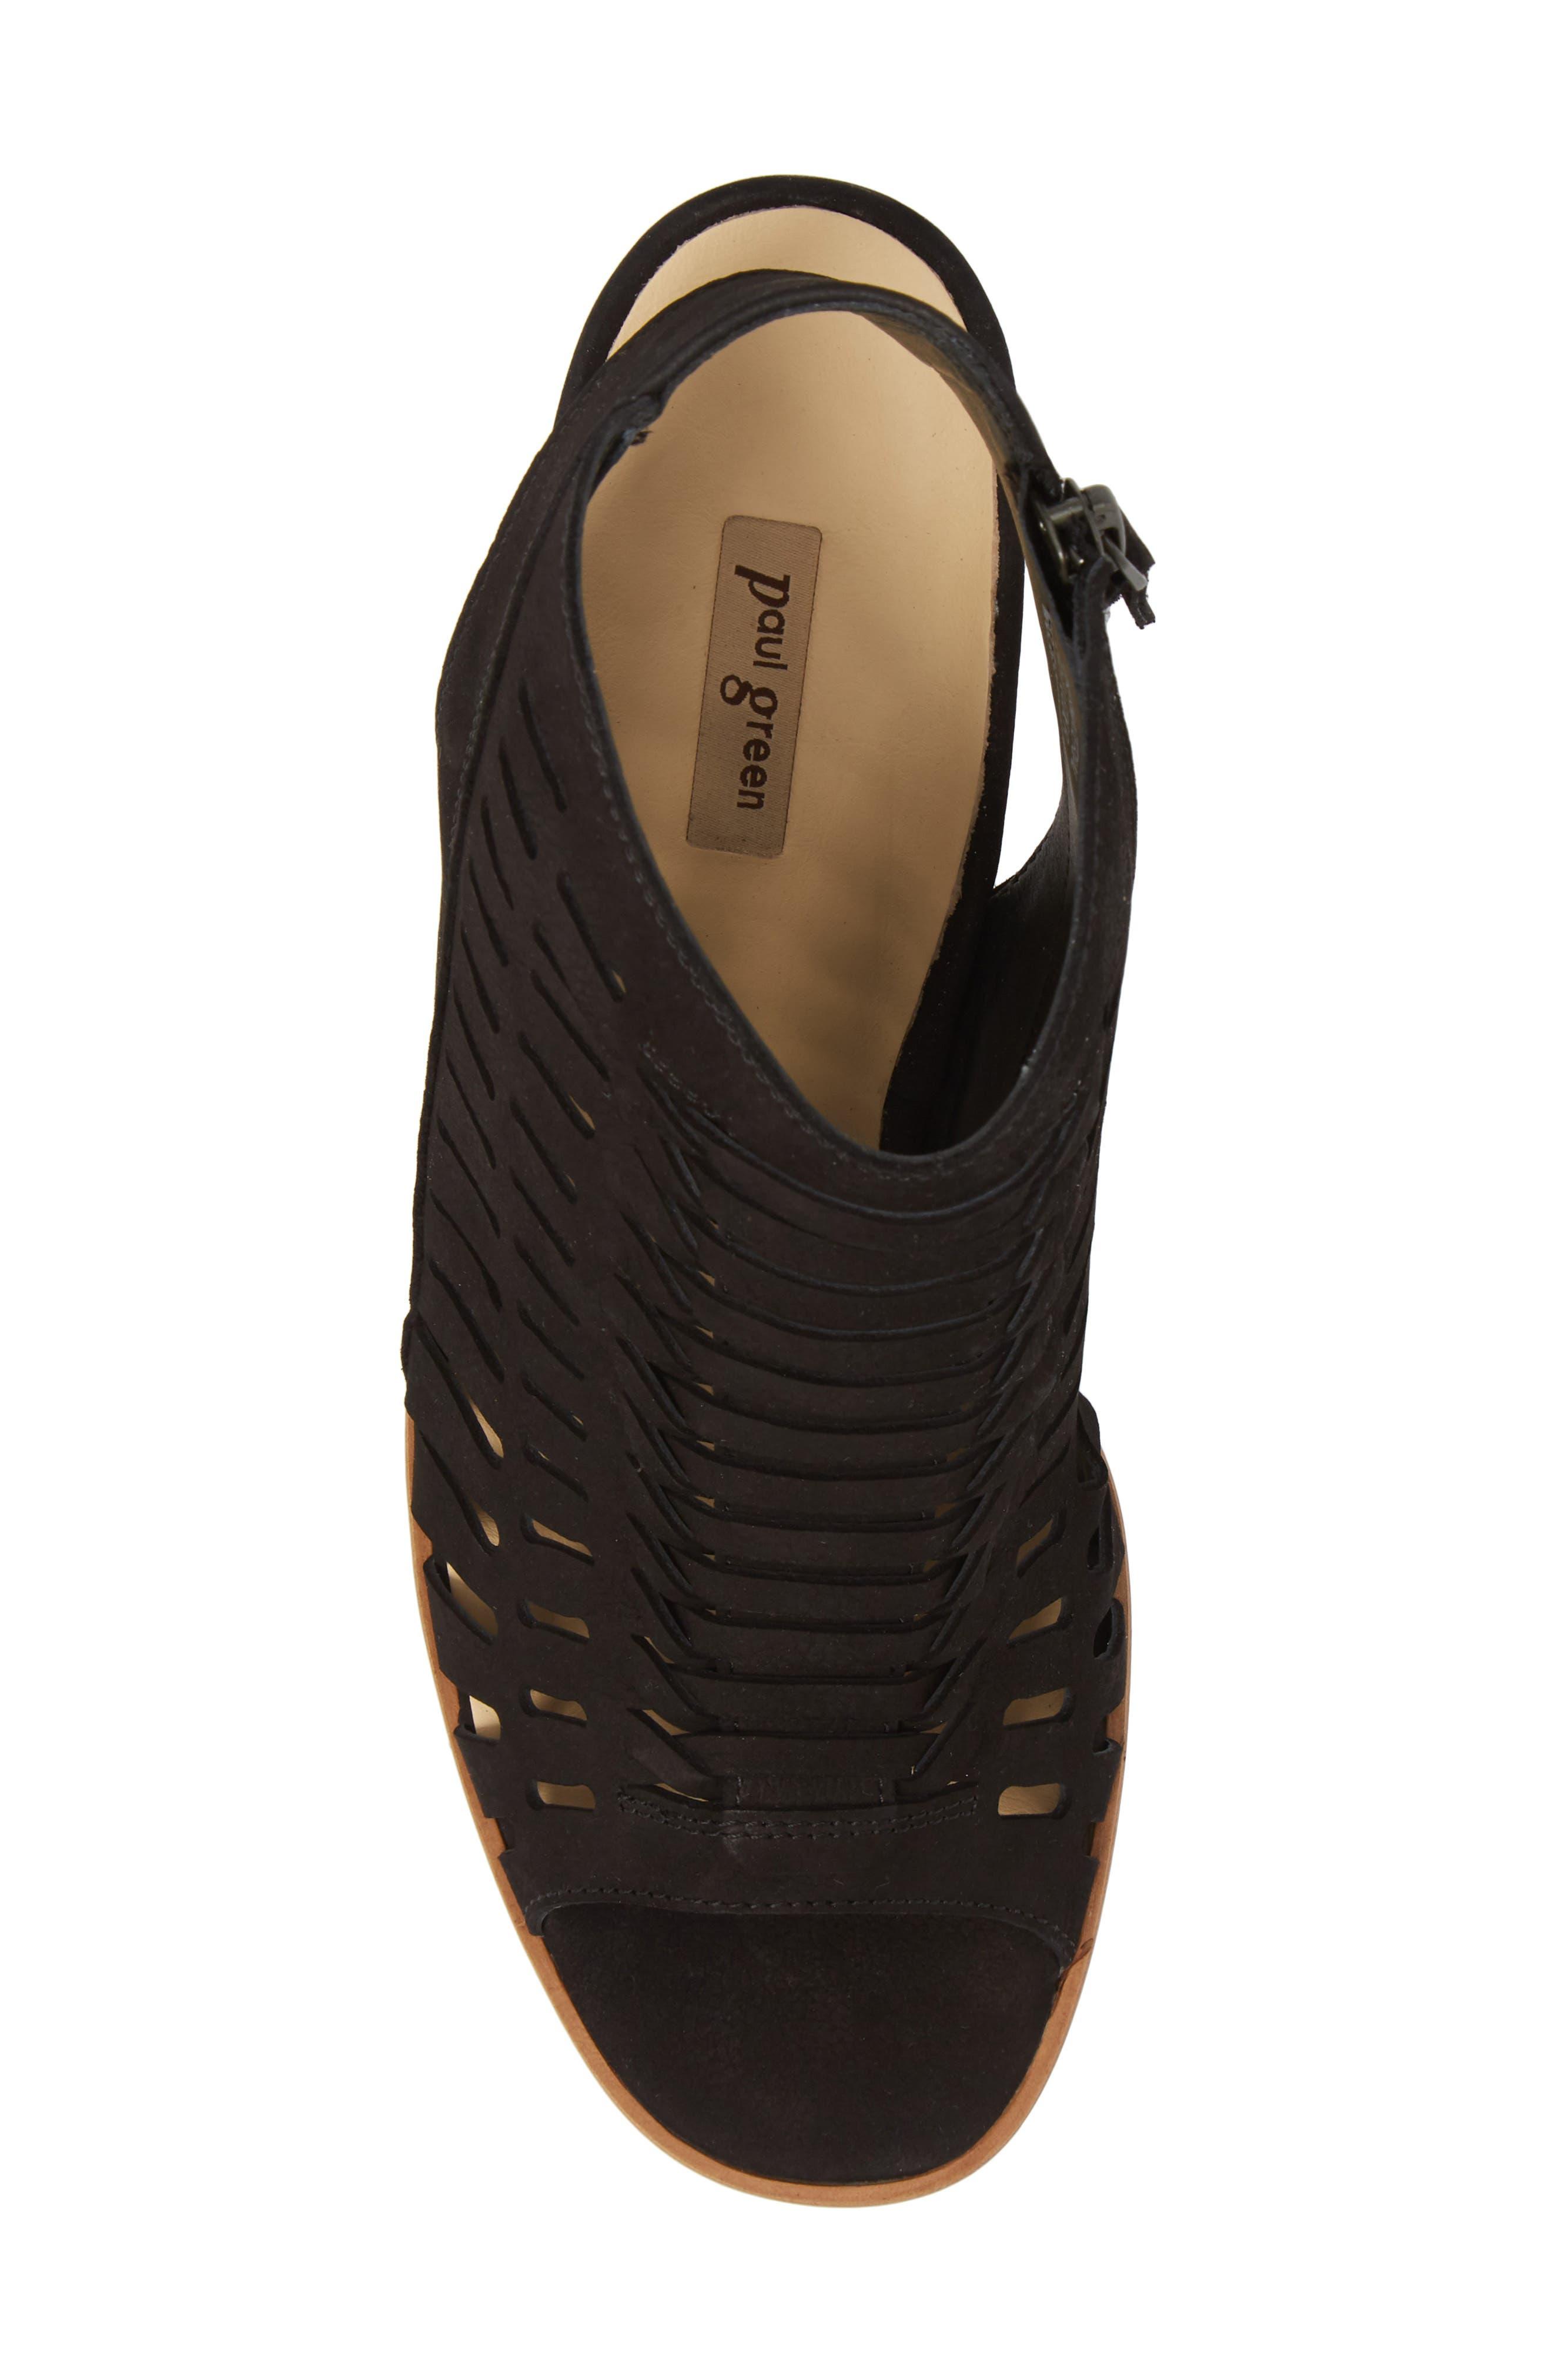 Rosa Woven Peep Toe Sandal,                             Alternate thumbnail 5, color,                             BLACK NUBUCK